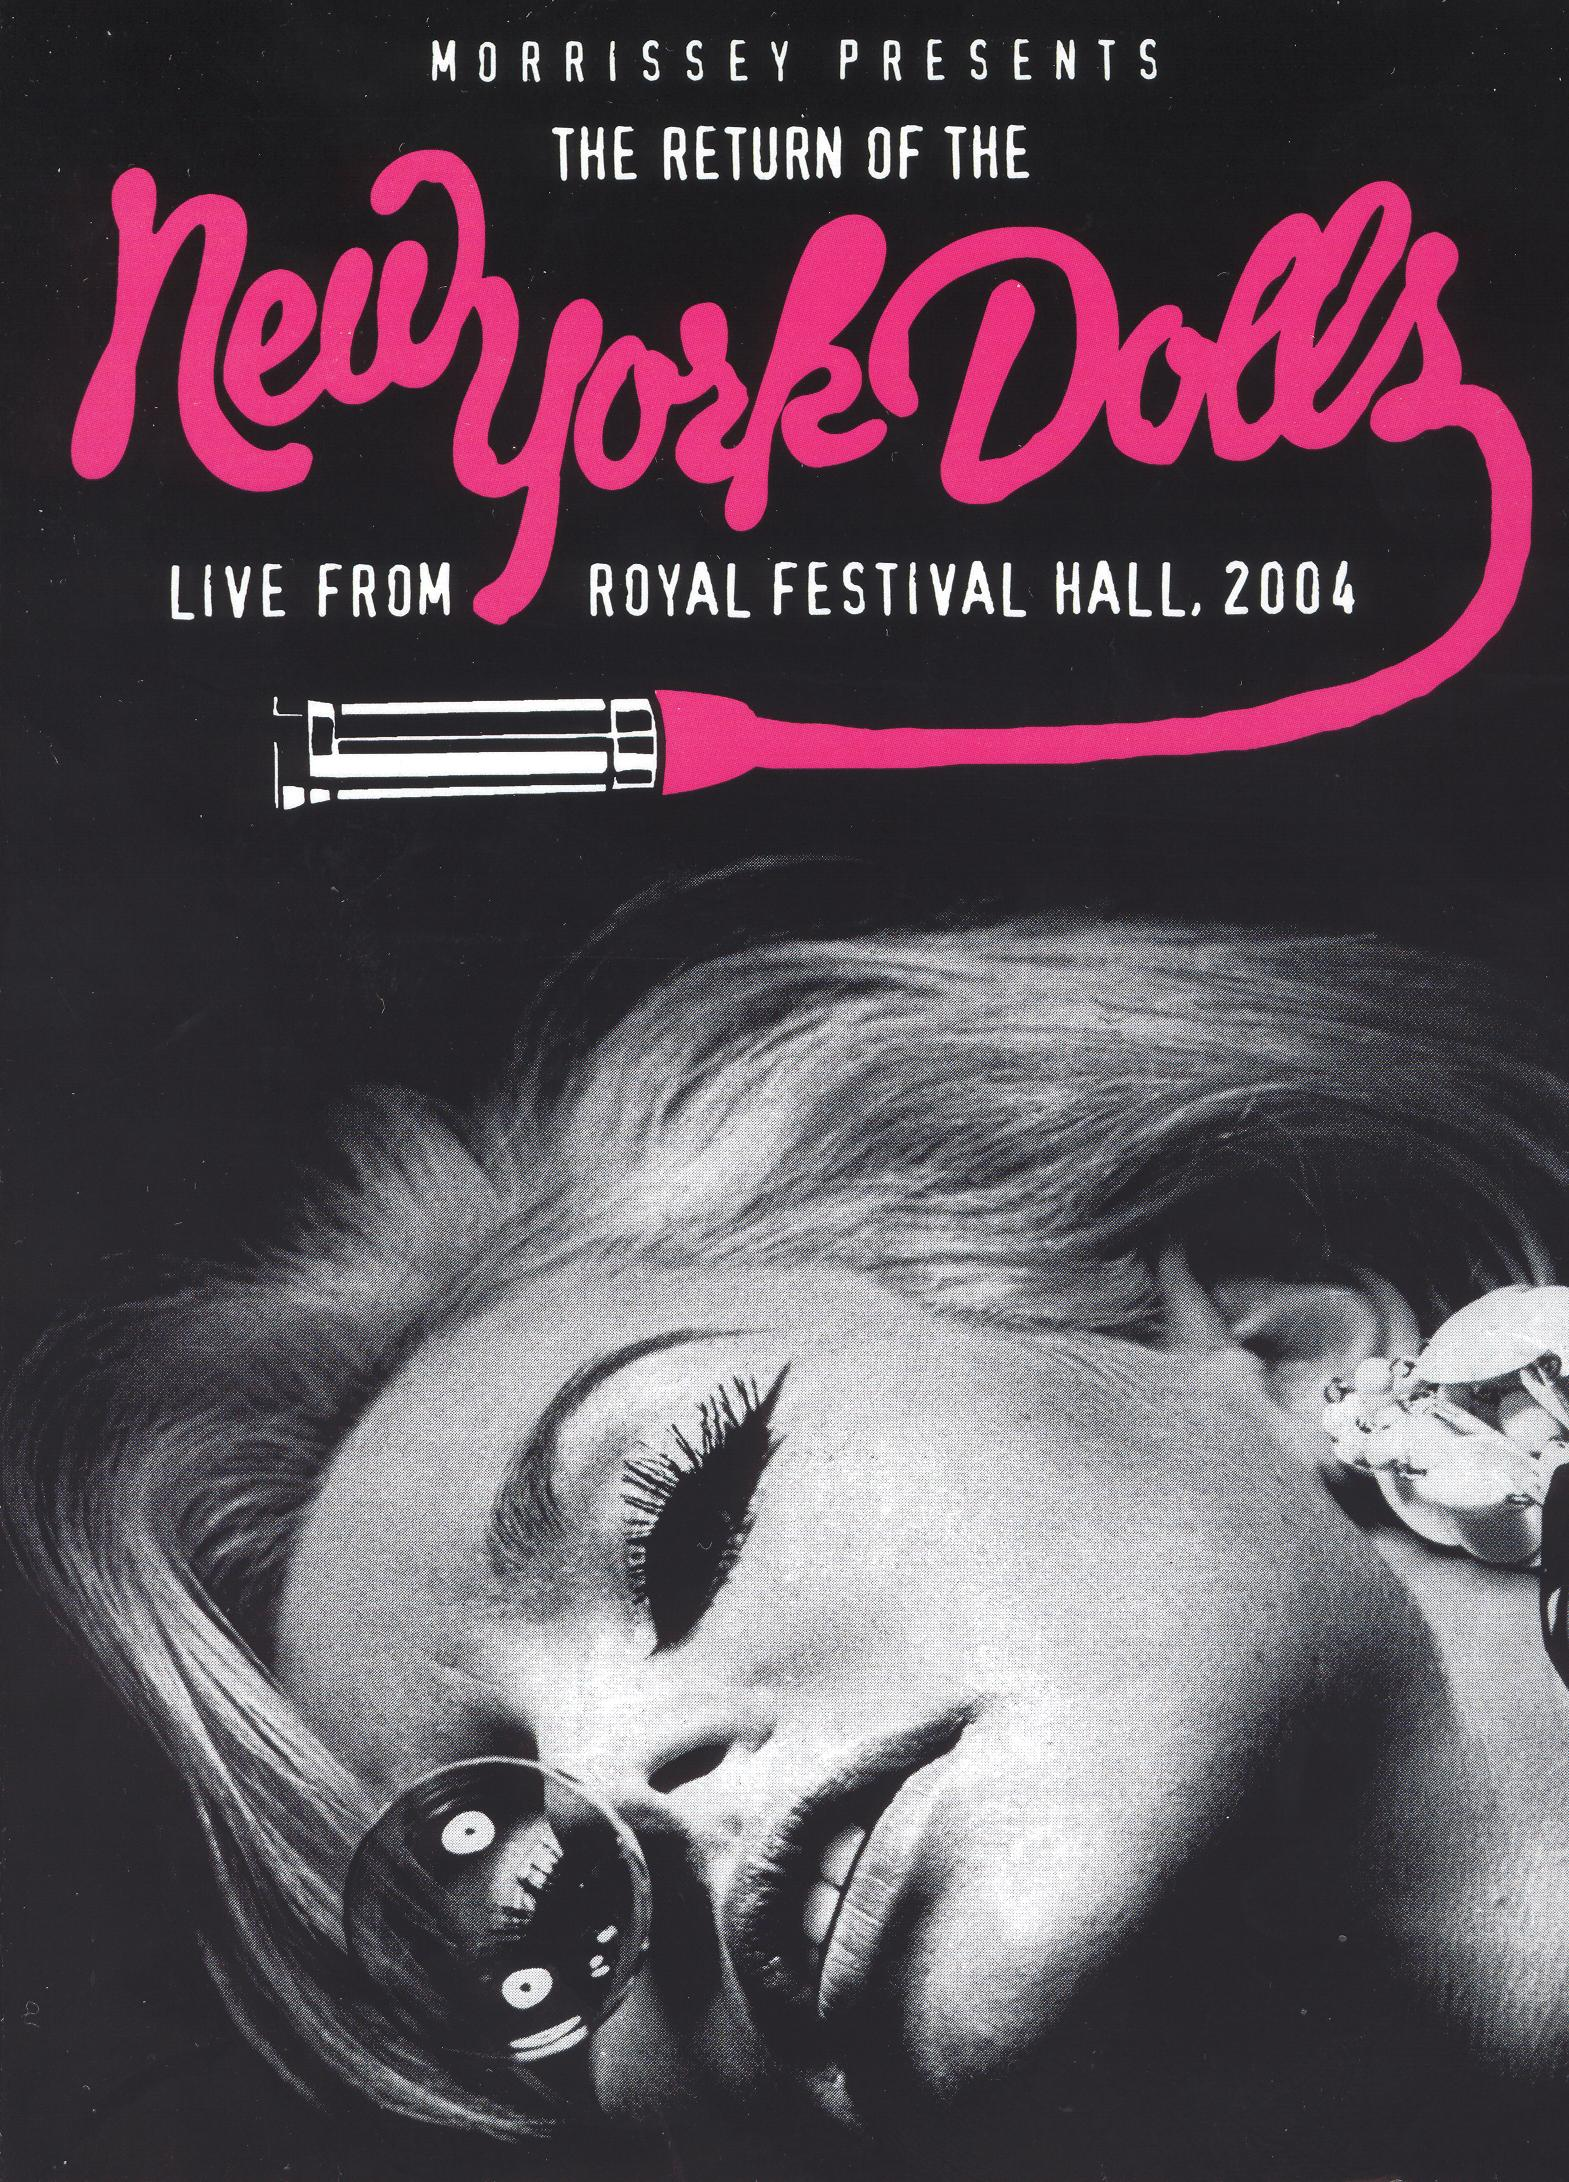 New York Dolls: Morrissey Presents the Return of the New York Dolls